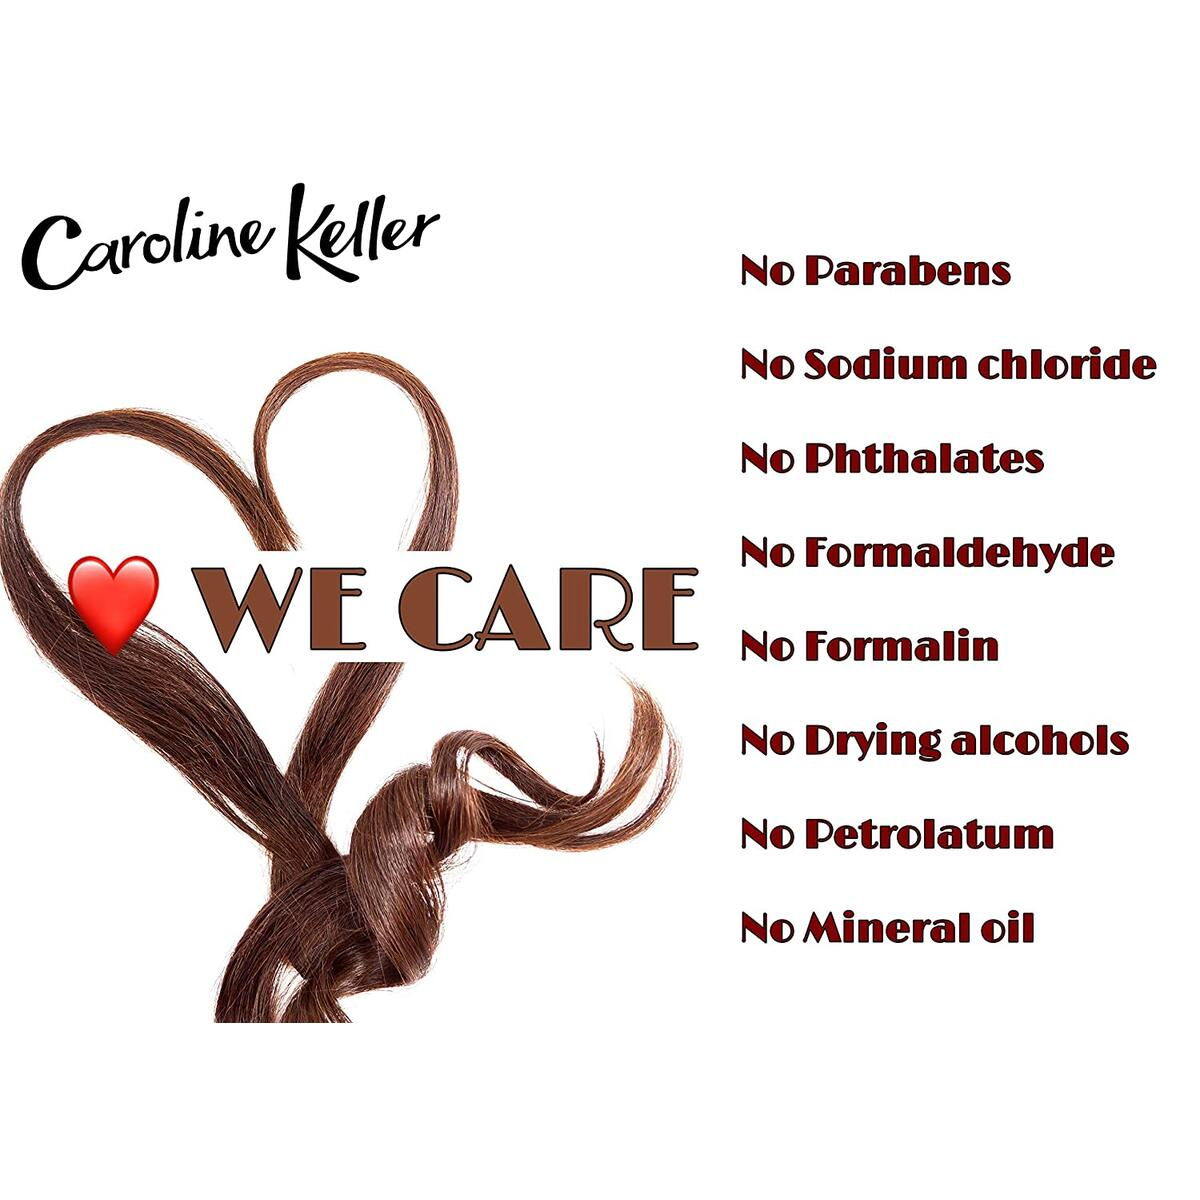 Keratin Shampoo for dry and damaged hair & scalp. With Aragan oil, Avocado oil, Keratin and Vitamins. Specially formulated for Post Keratin Treatments. Salt Free. 16.9 fl.Oz, by Caroline Keller.